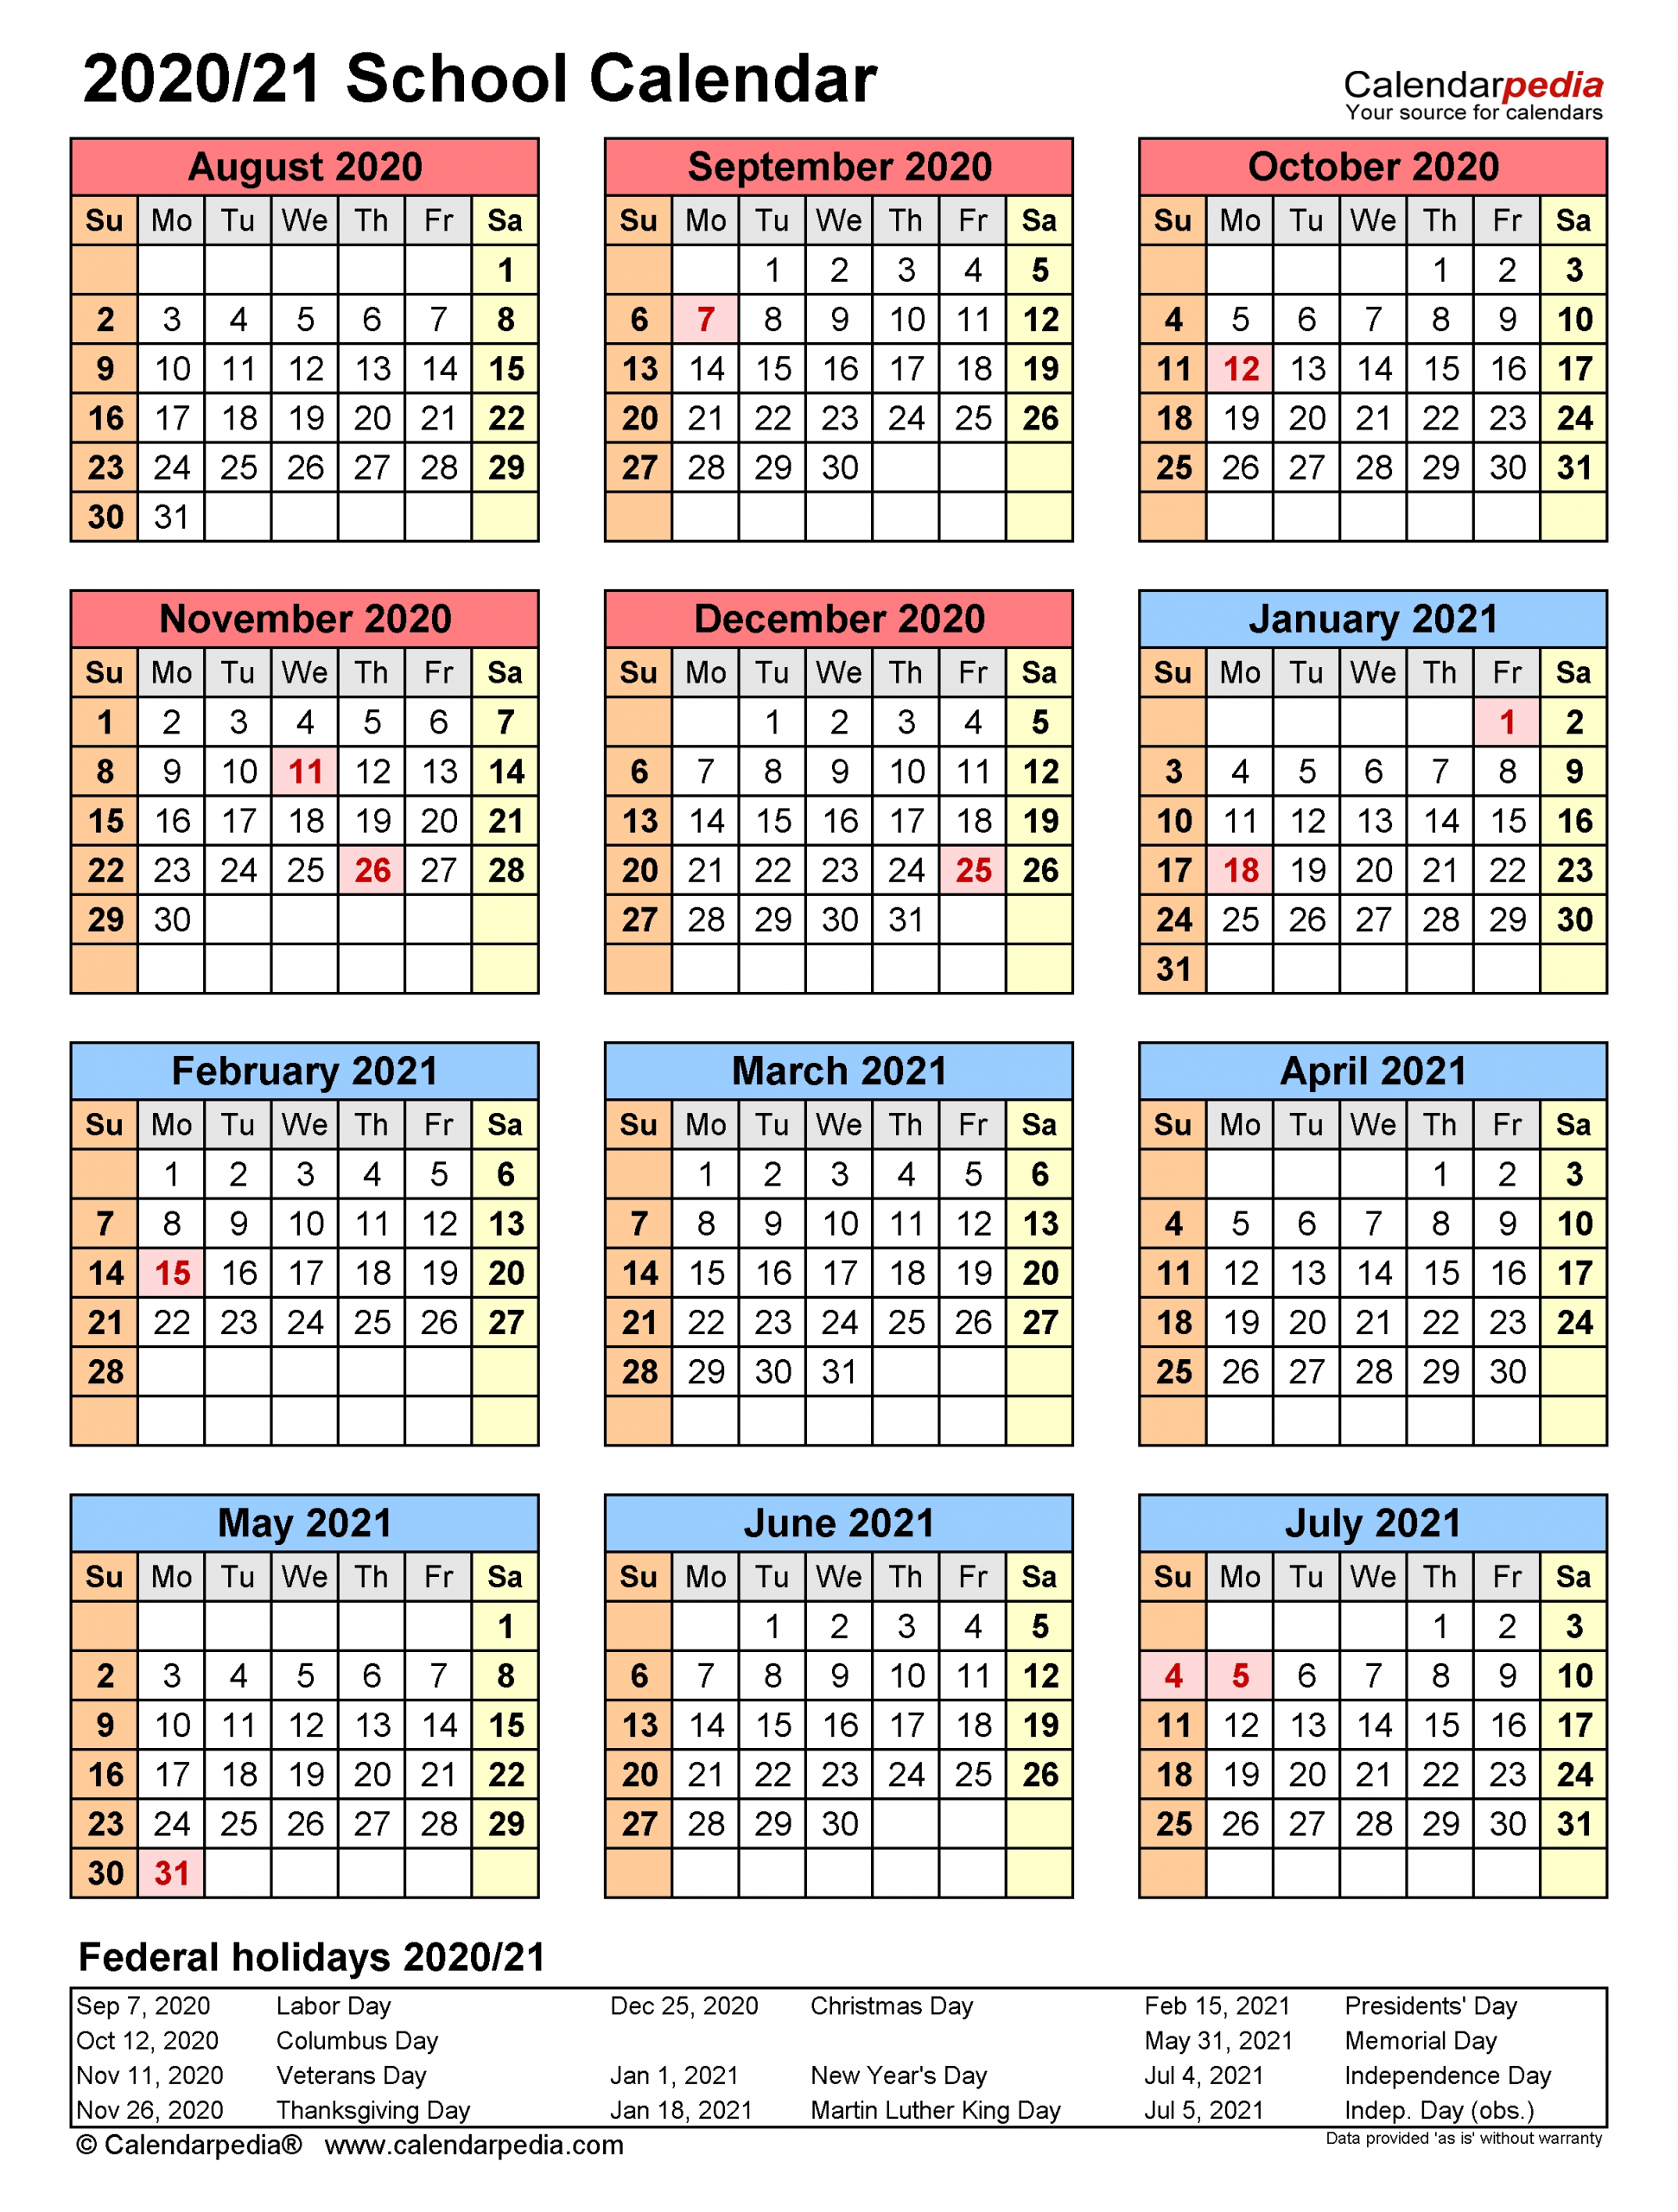 School Calendars 2020/2021 - Free Printable Word Templates